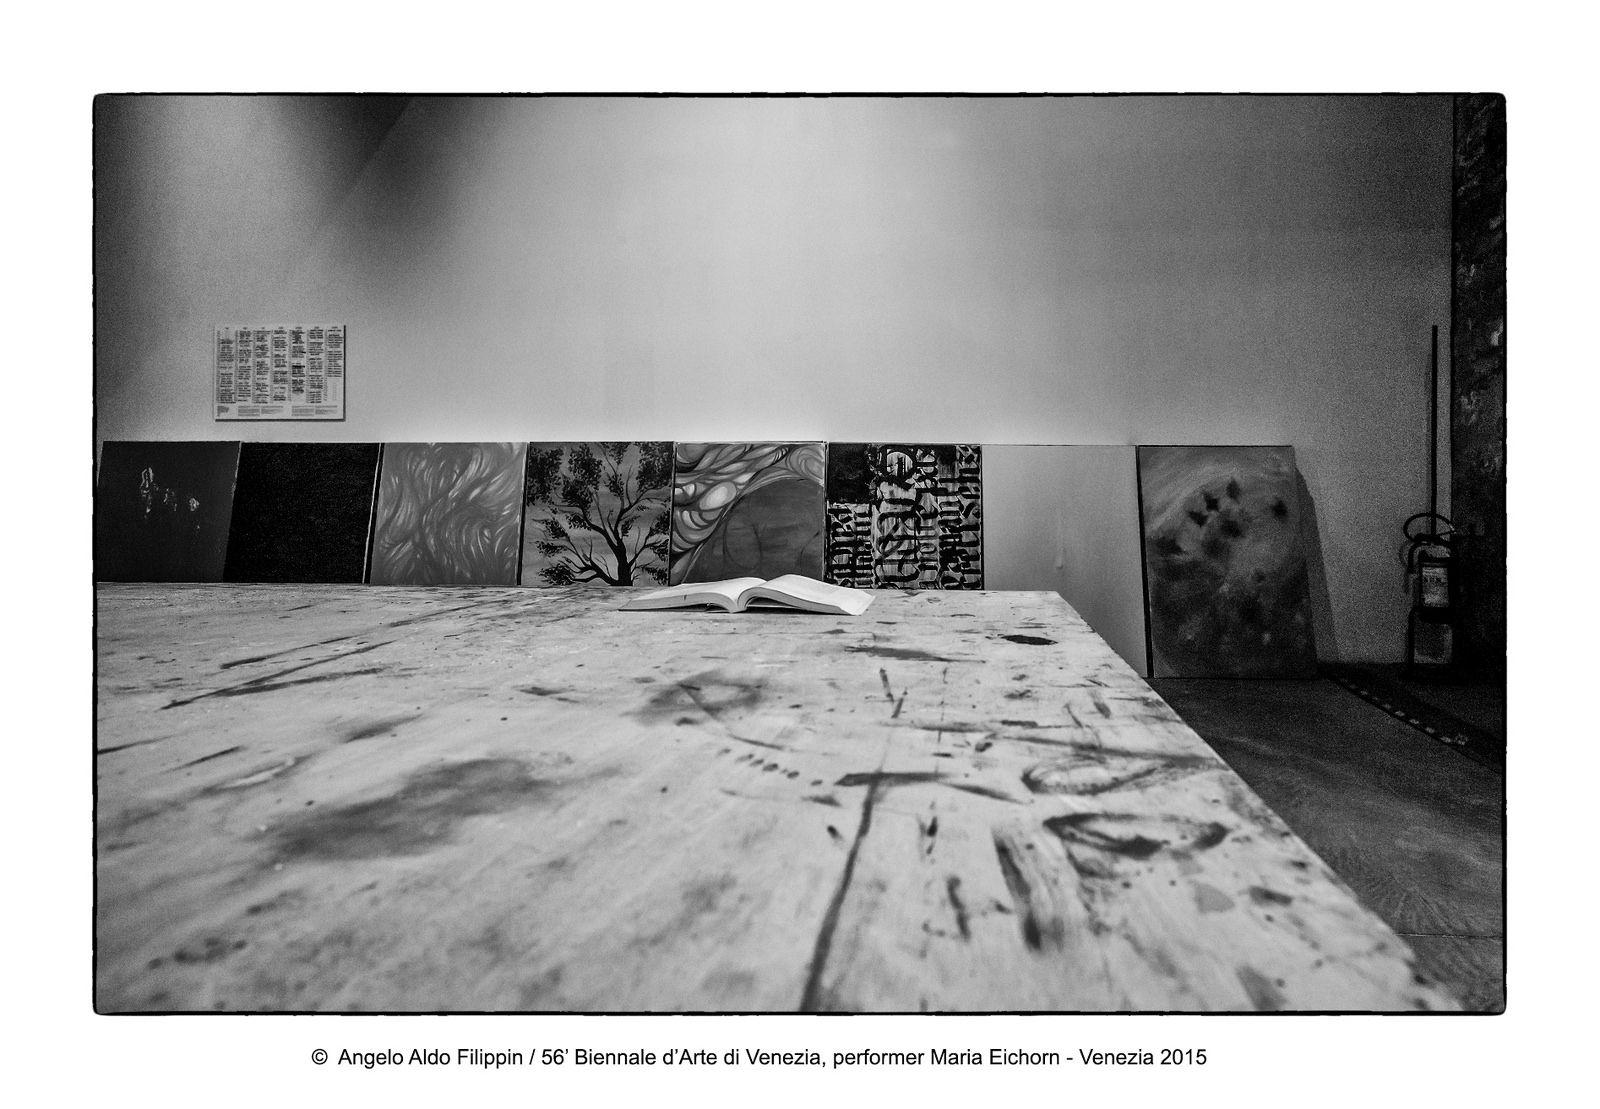 https://flic.kr/p/LC63Tv | 56' Biennale d'Arte di Venezia, performer Maria Eichorm  - Venezia 2015